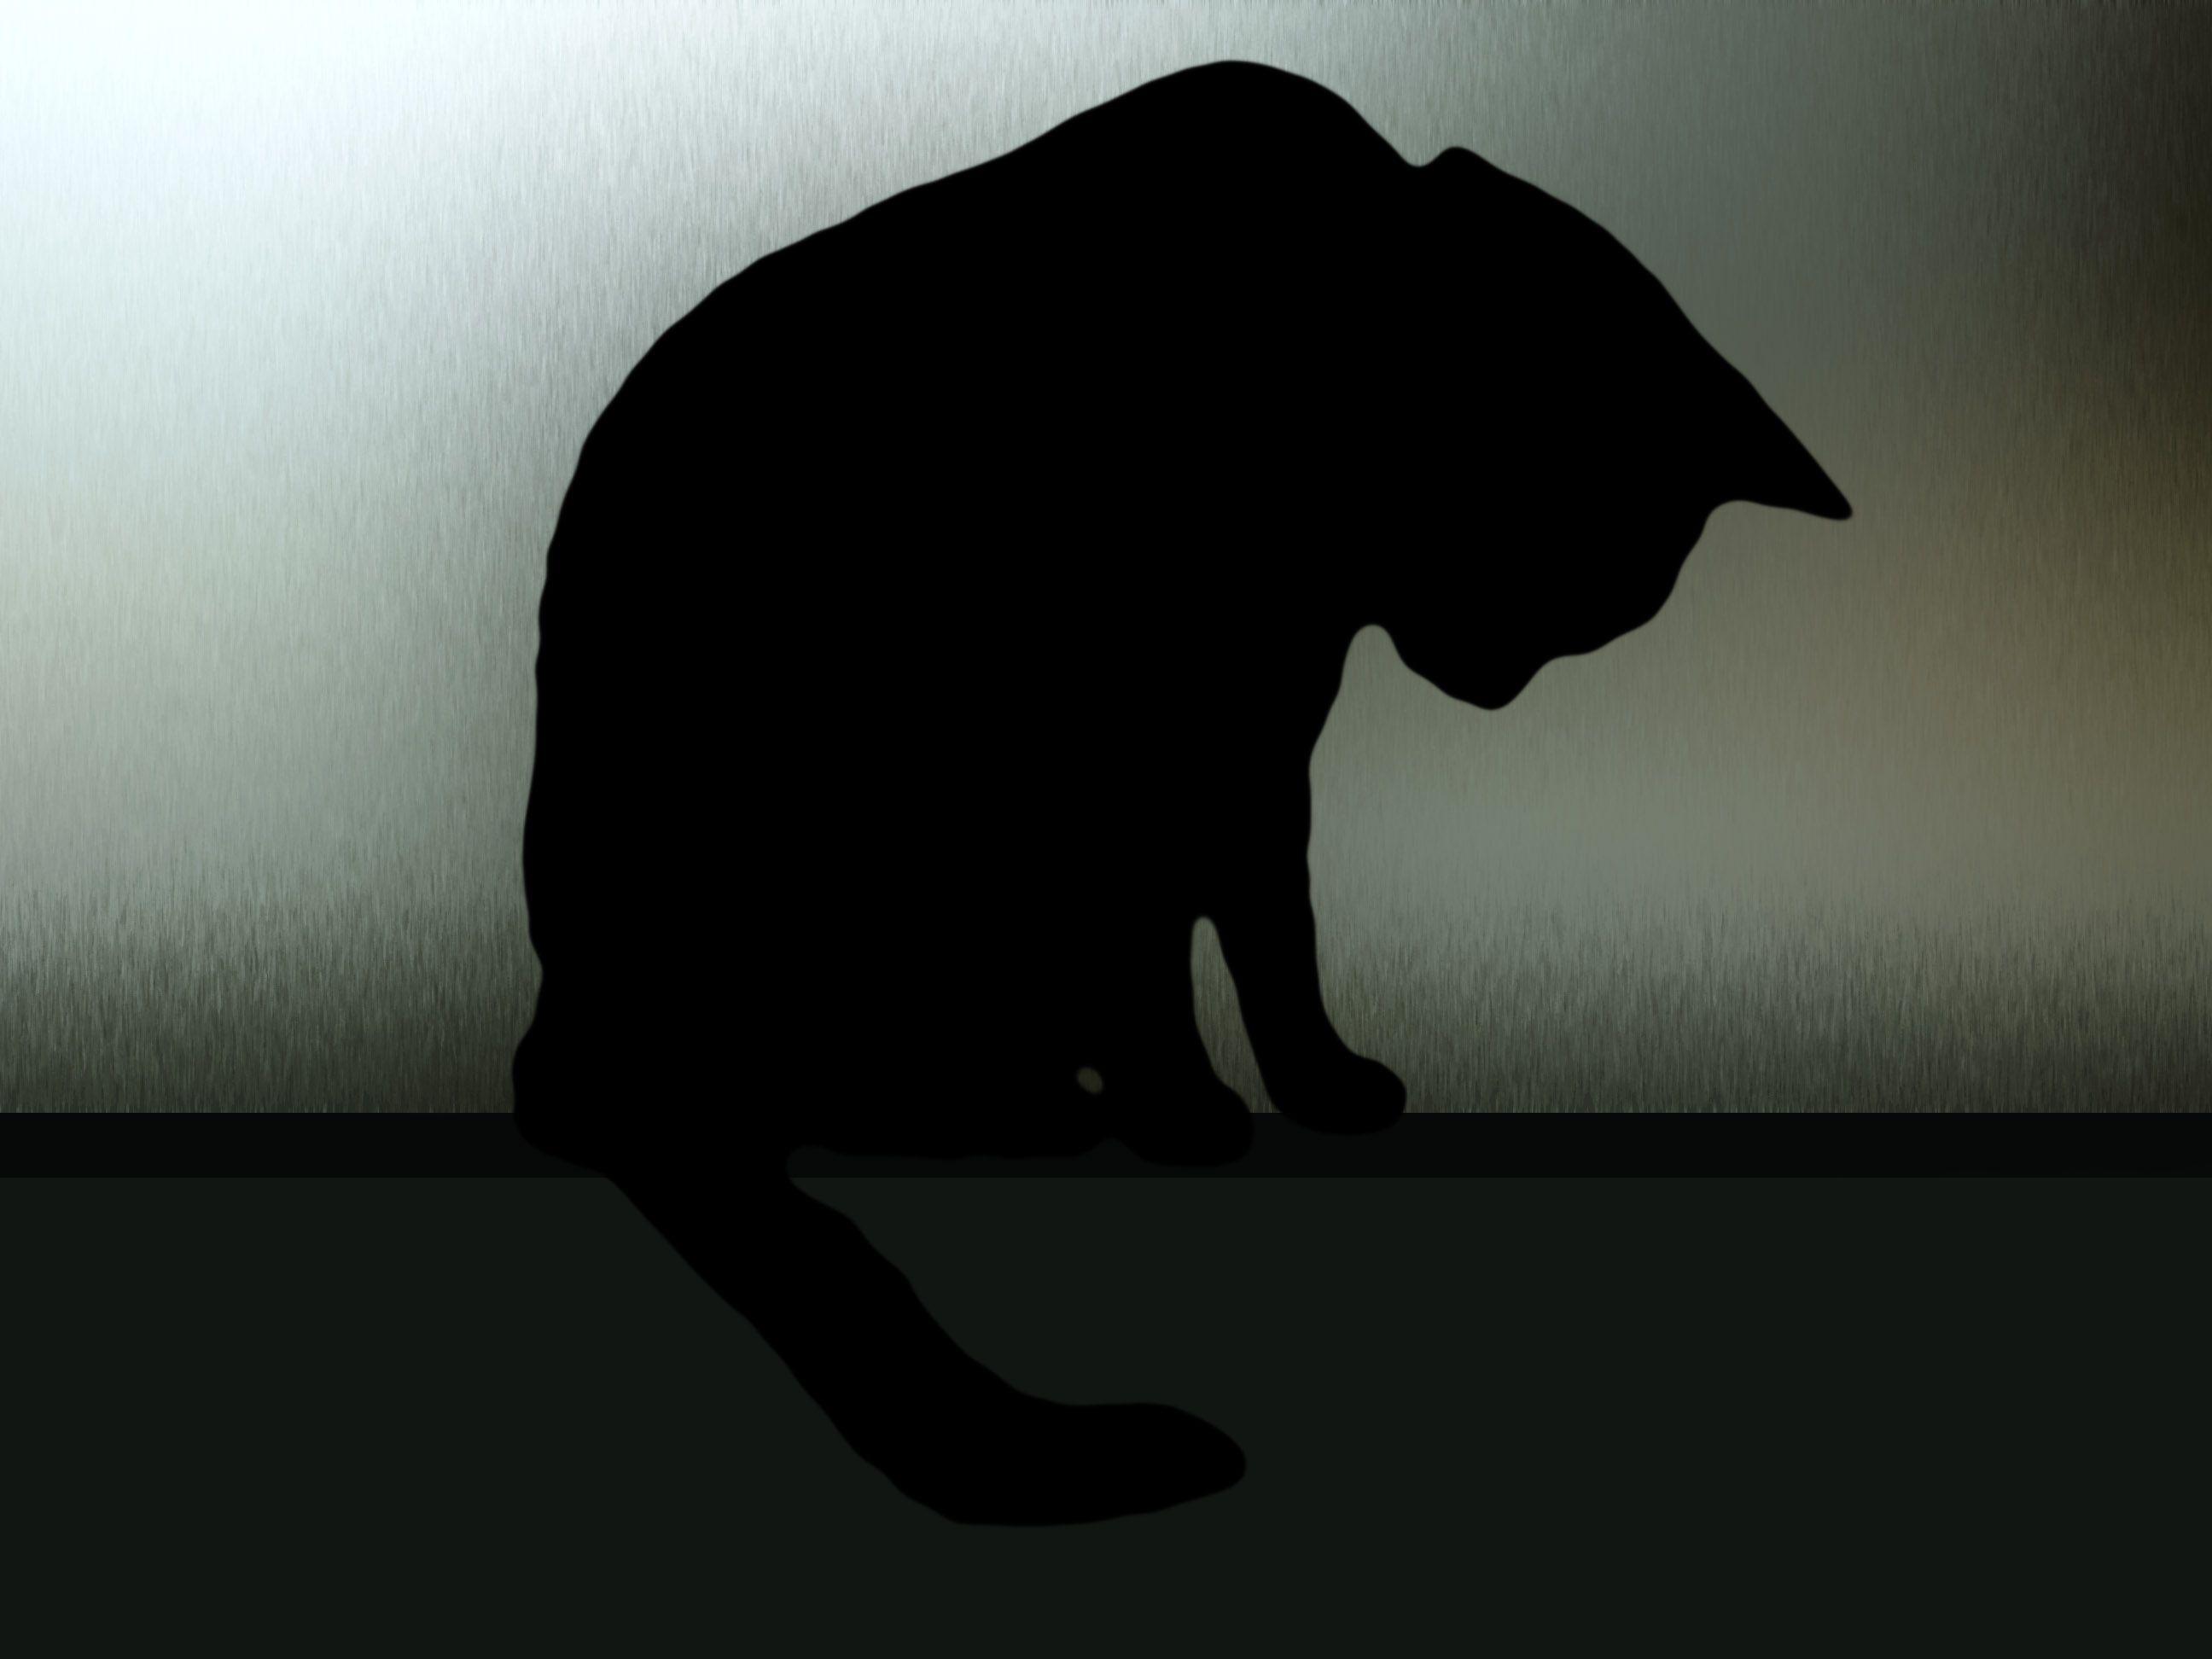 A sad cat by ~Ruby125 on deviantART  ruby125.deviantart.com